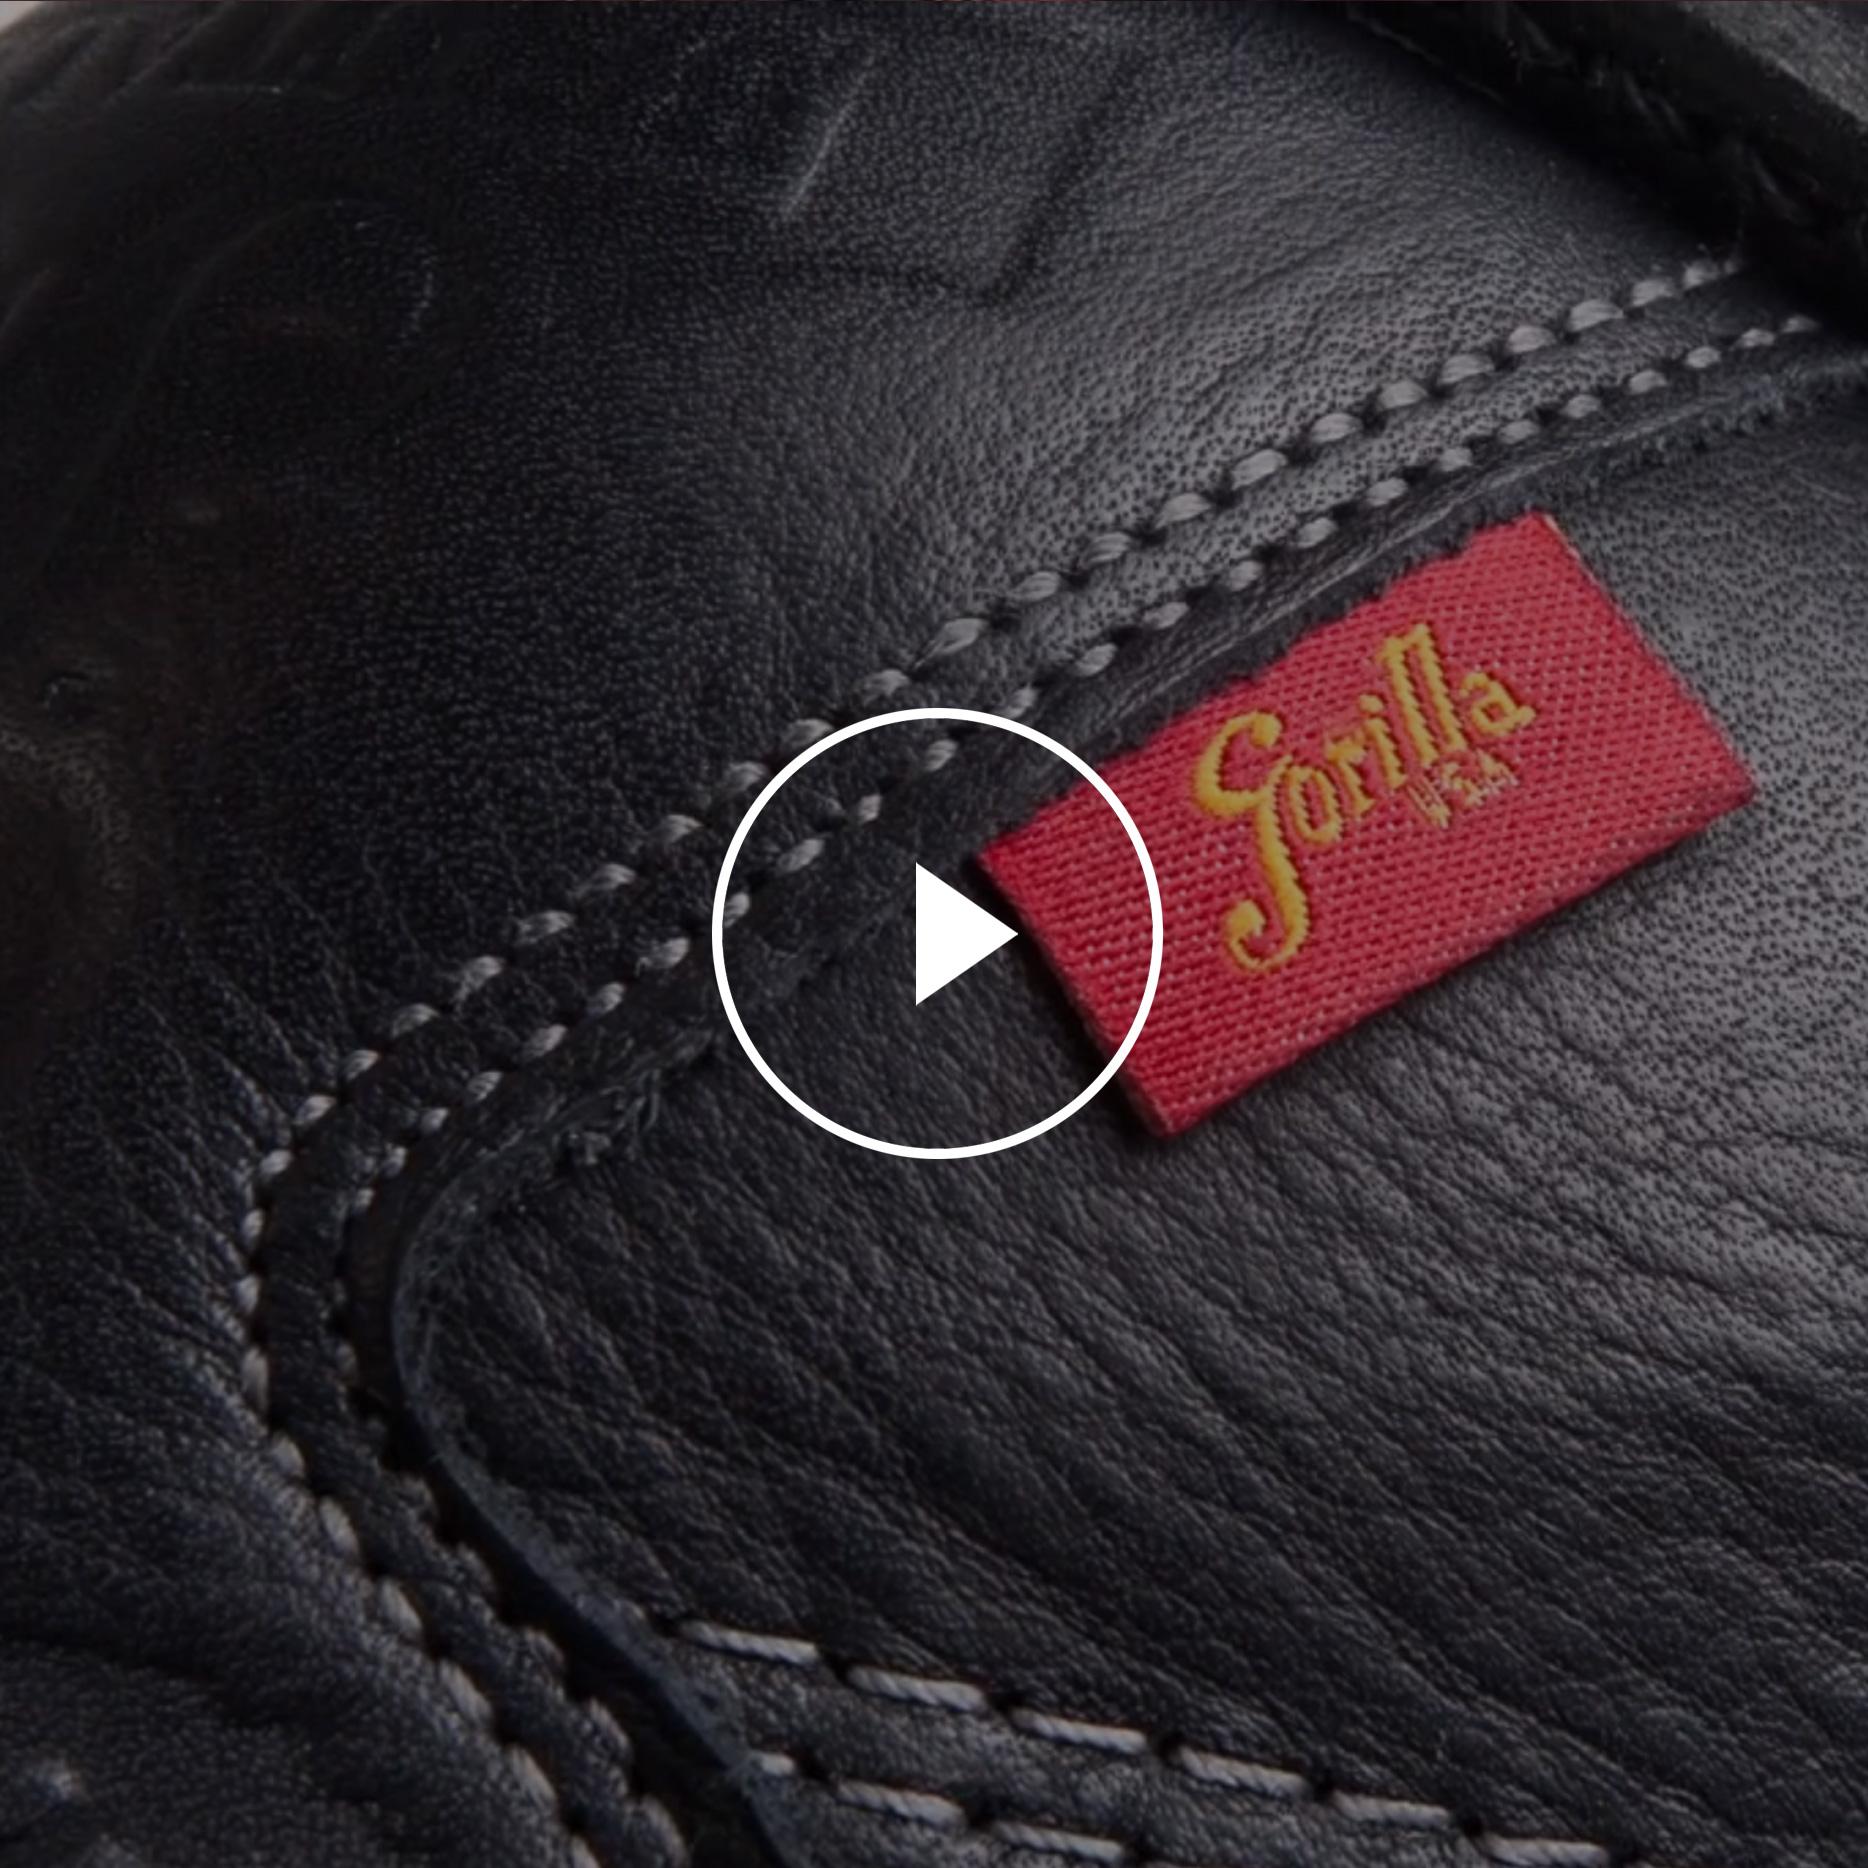 gorilla_strat_th_try3_VIDEO